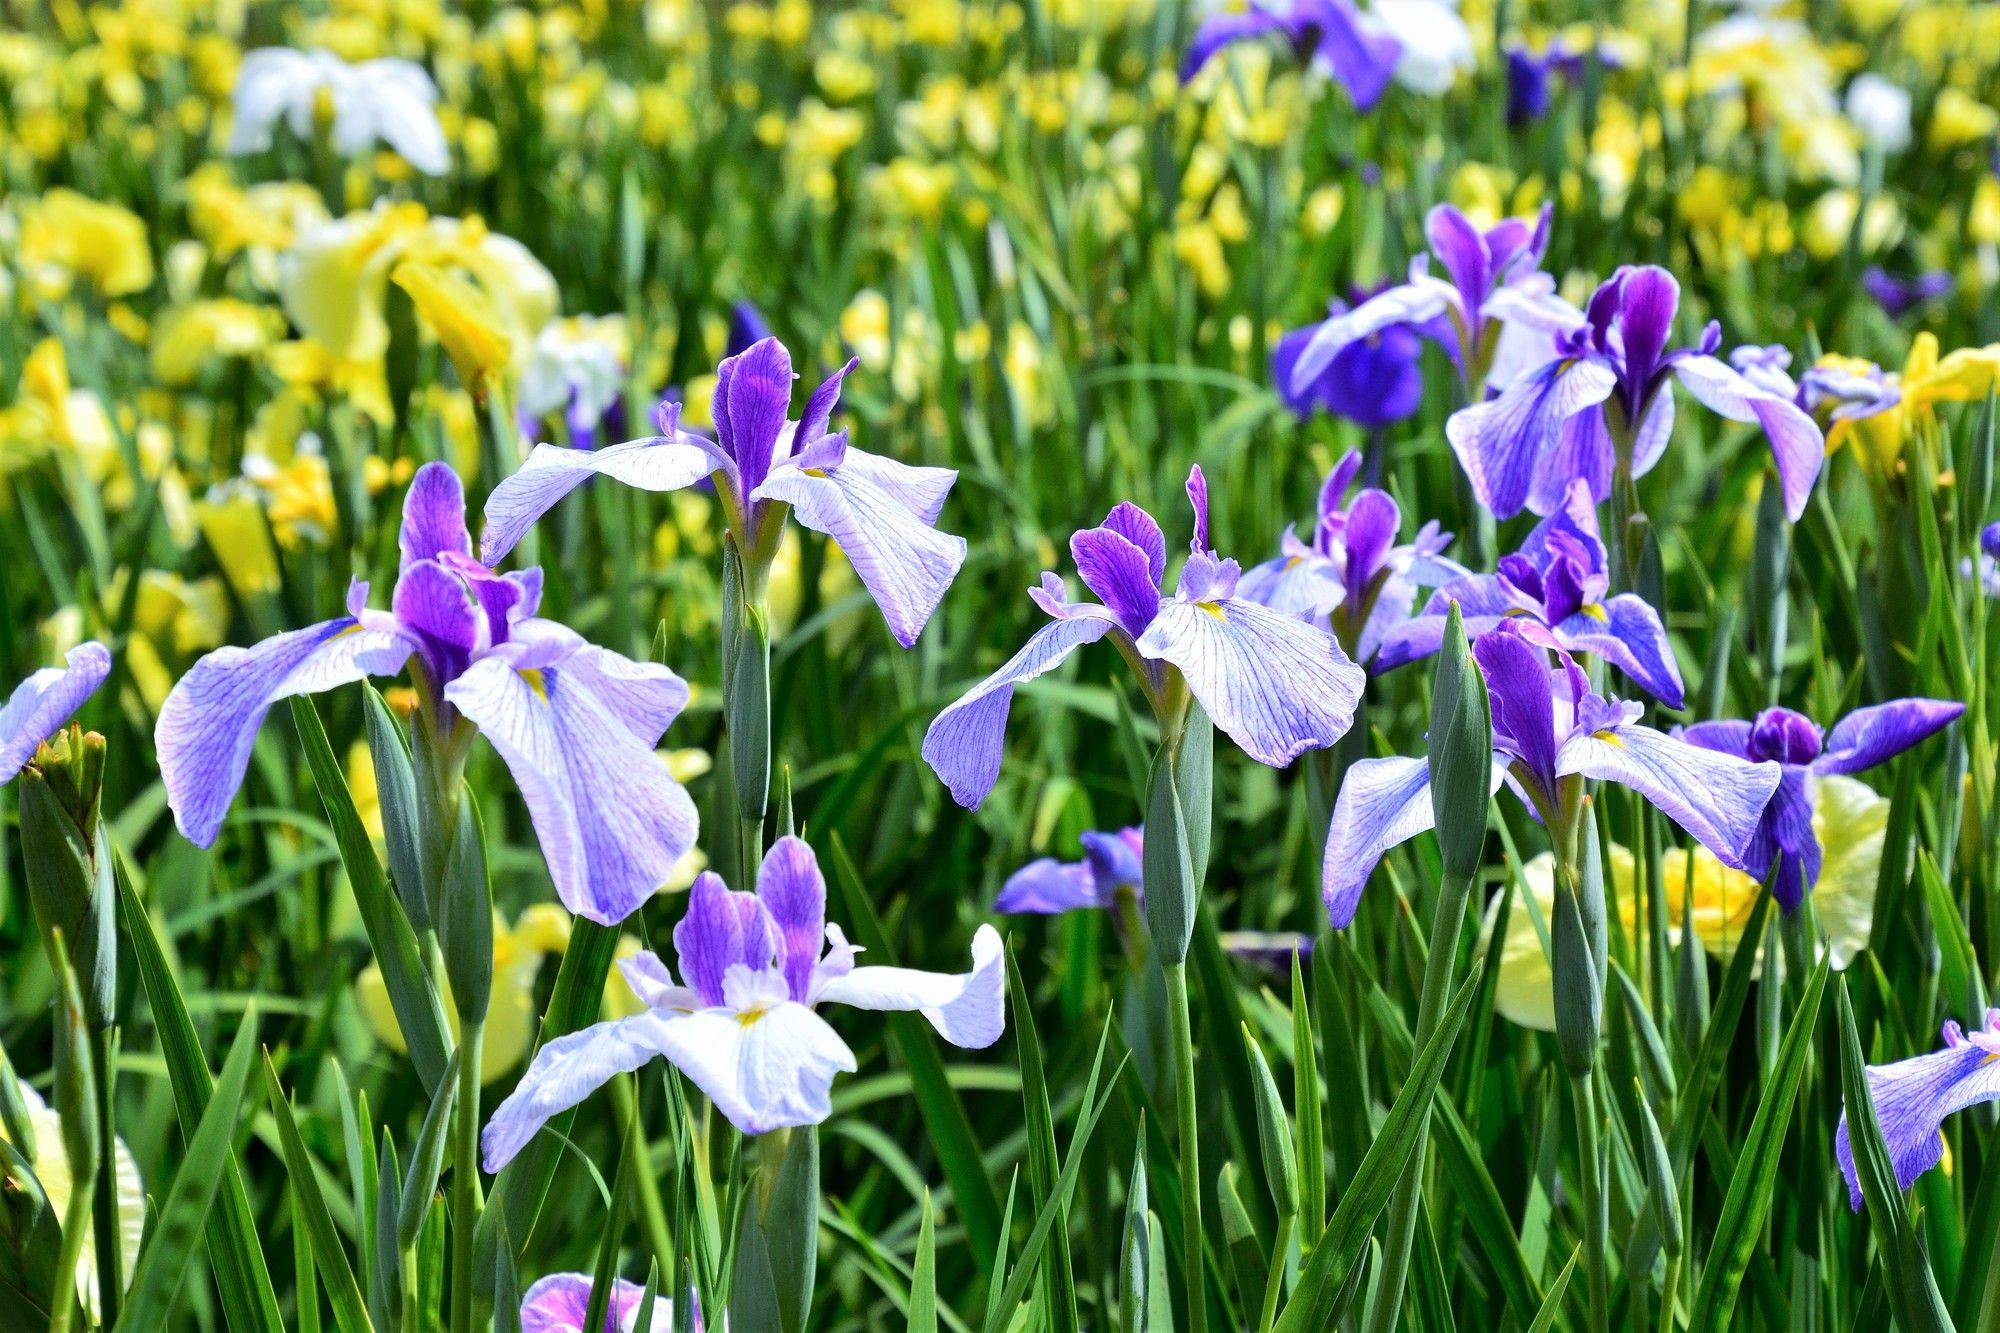 Japanese irises